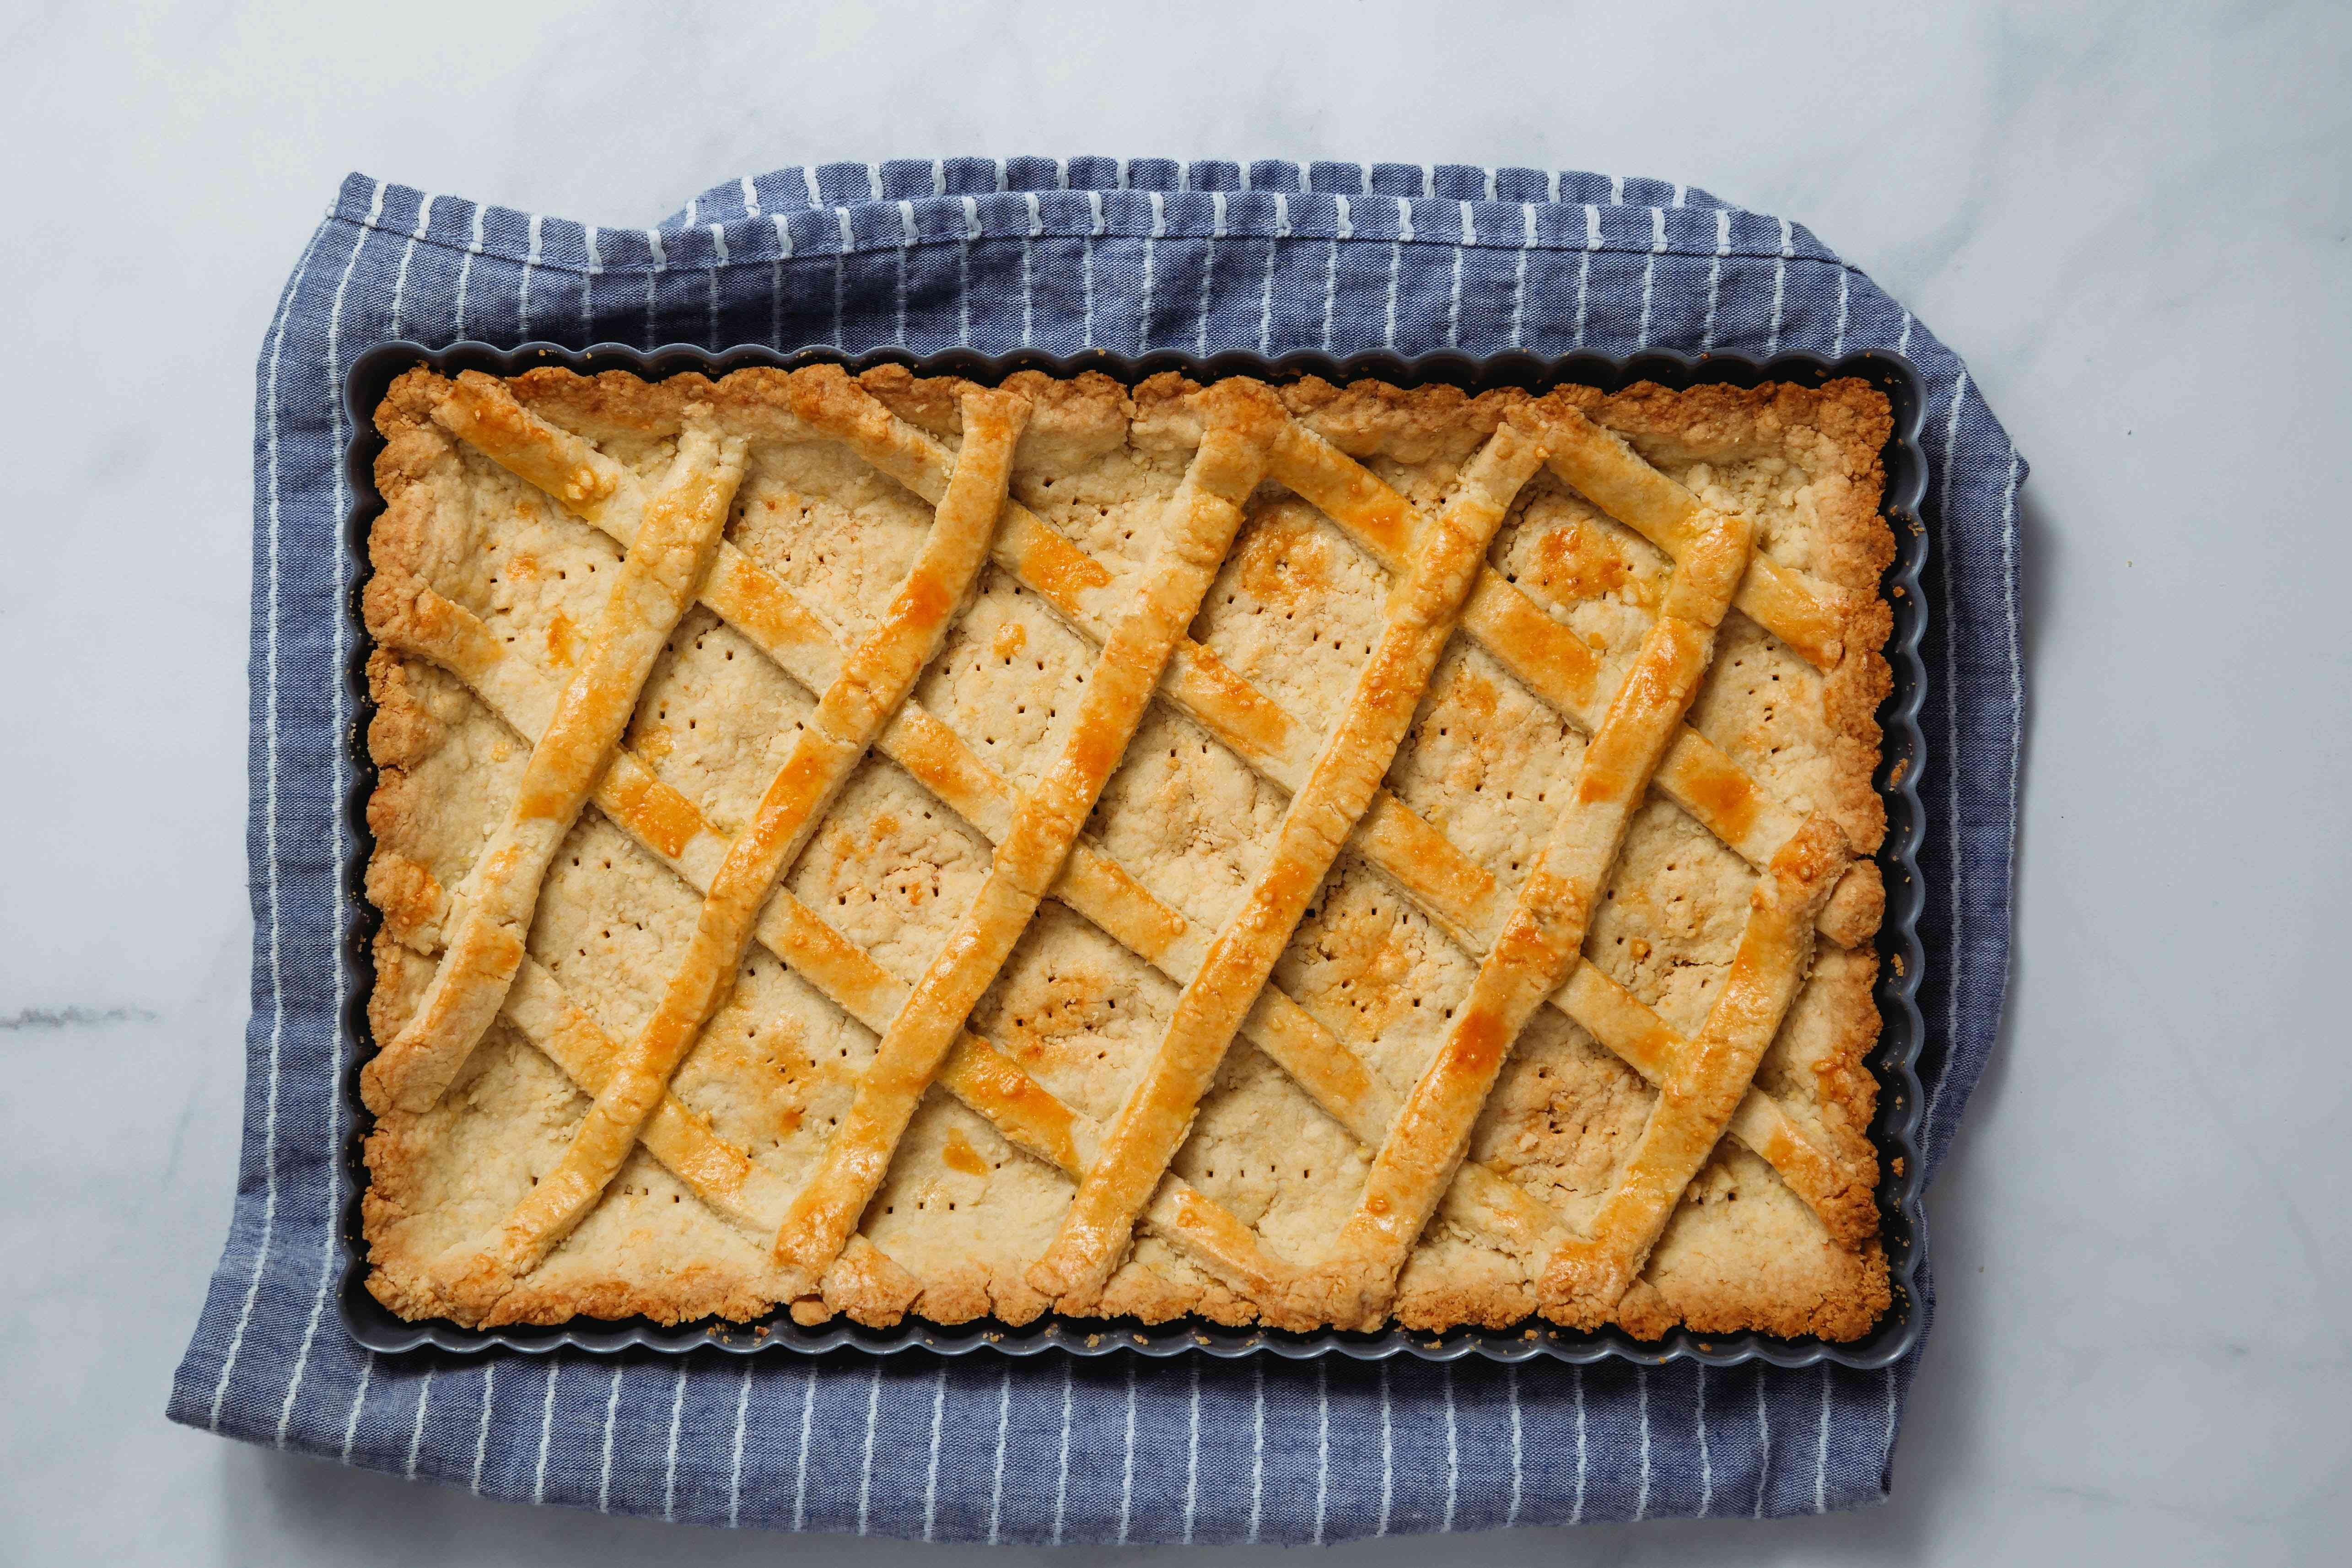 tart dough baked in pan resting on towl